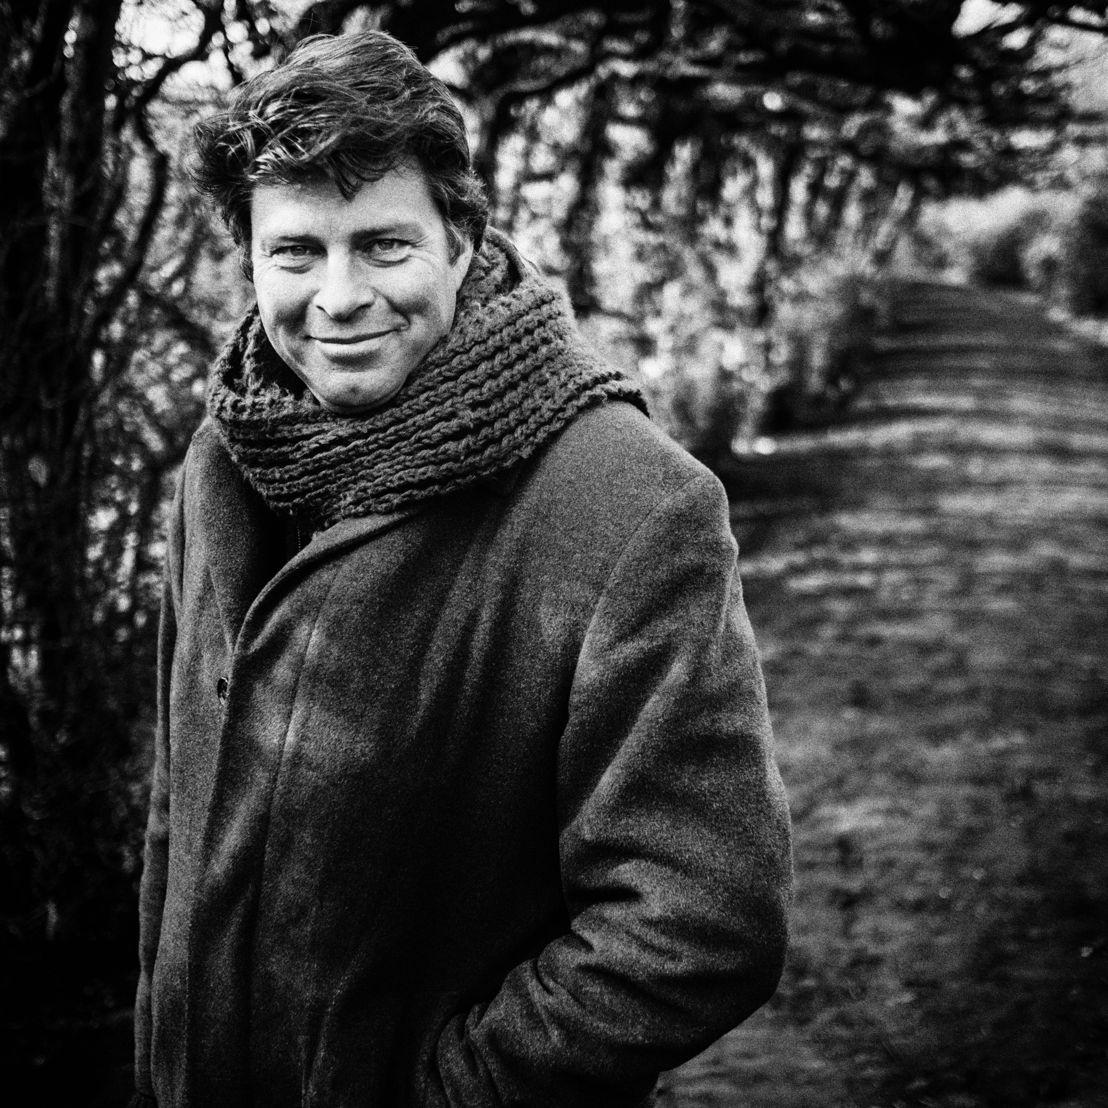 Wim Lybaert (c) Thomas Sweertvaegher